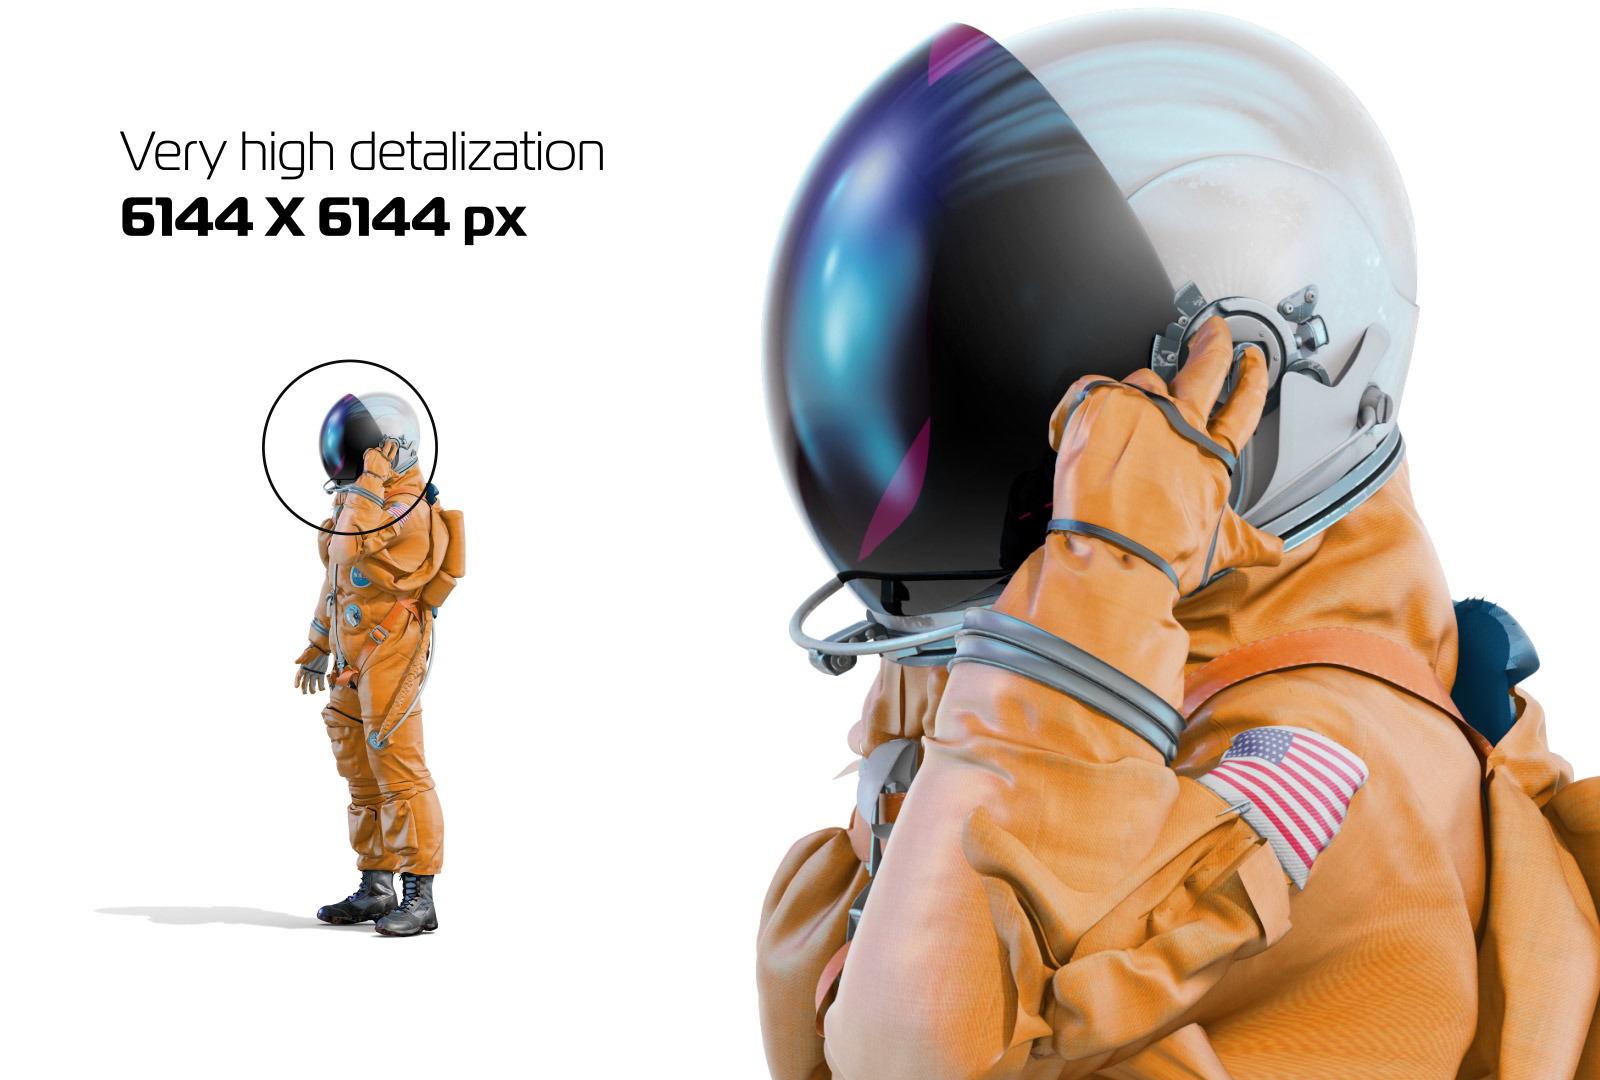 PSD Mockup 3D model NASA Astronaut #30